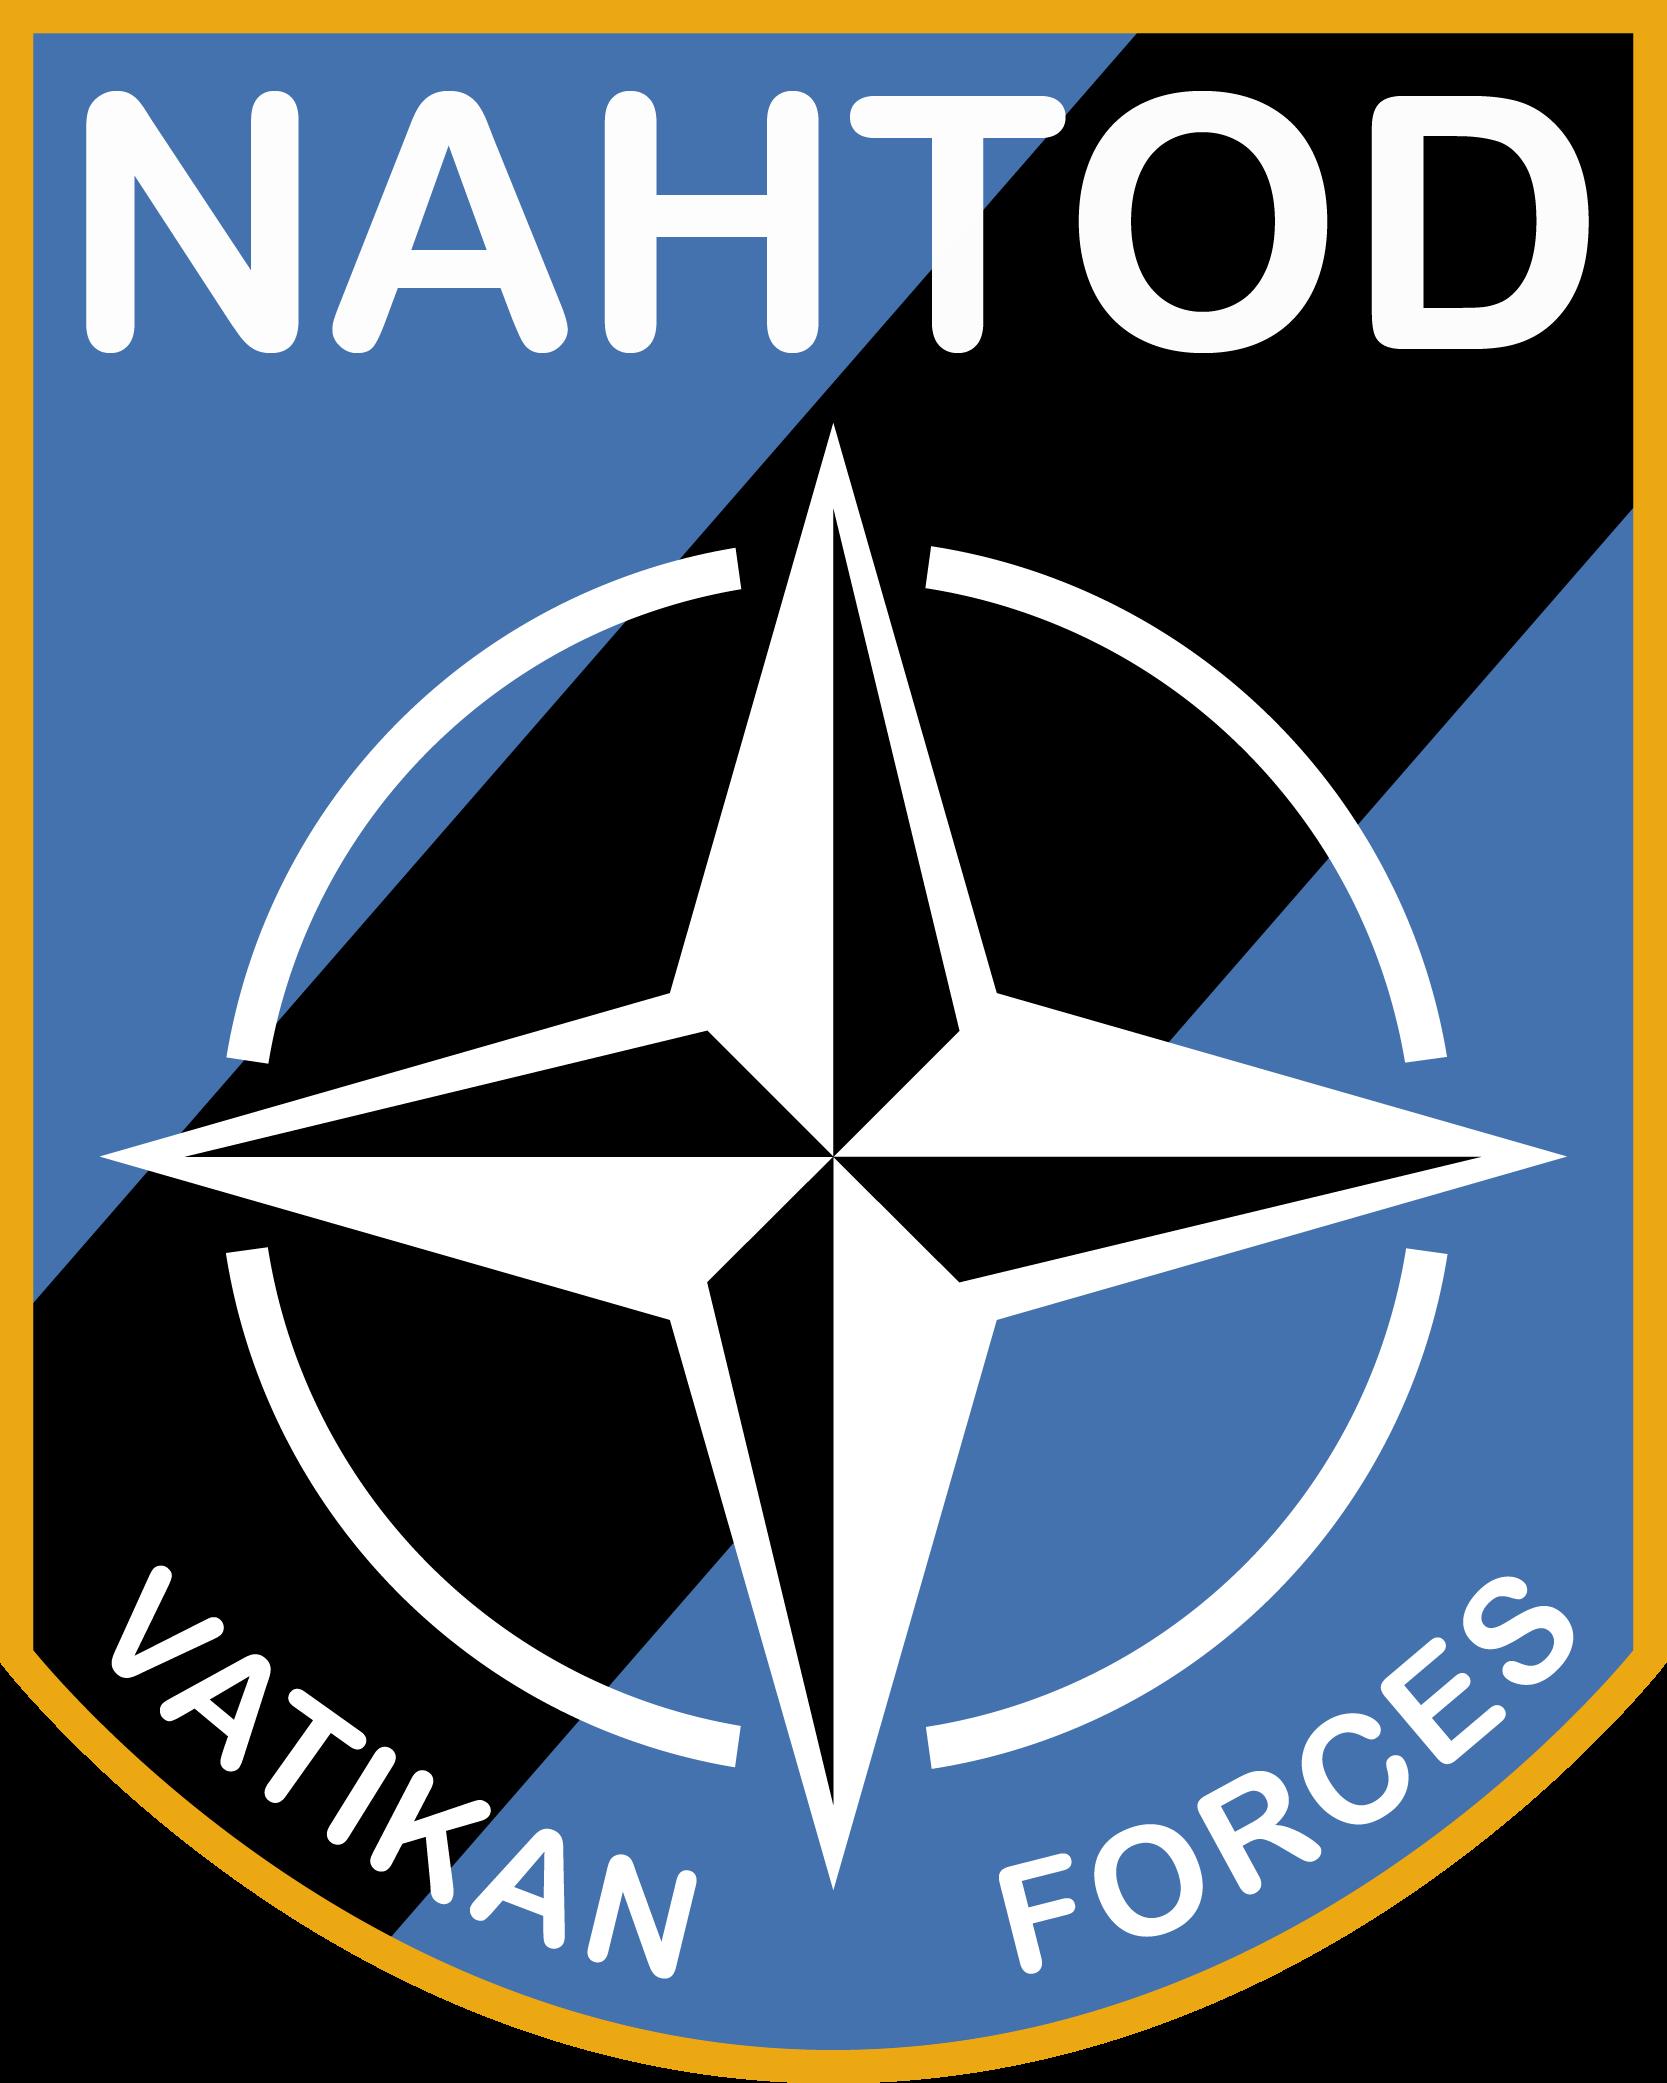 NAHTOD-Vatikan-Forces